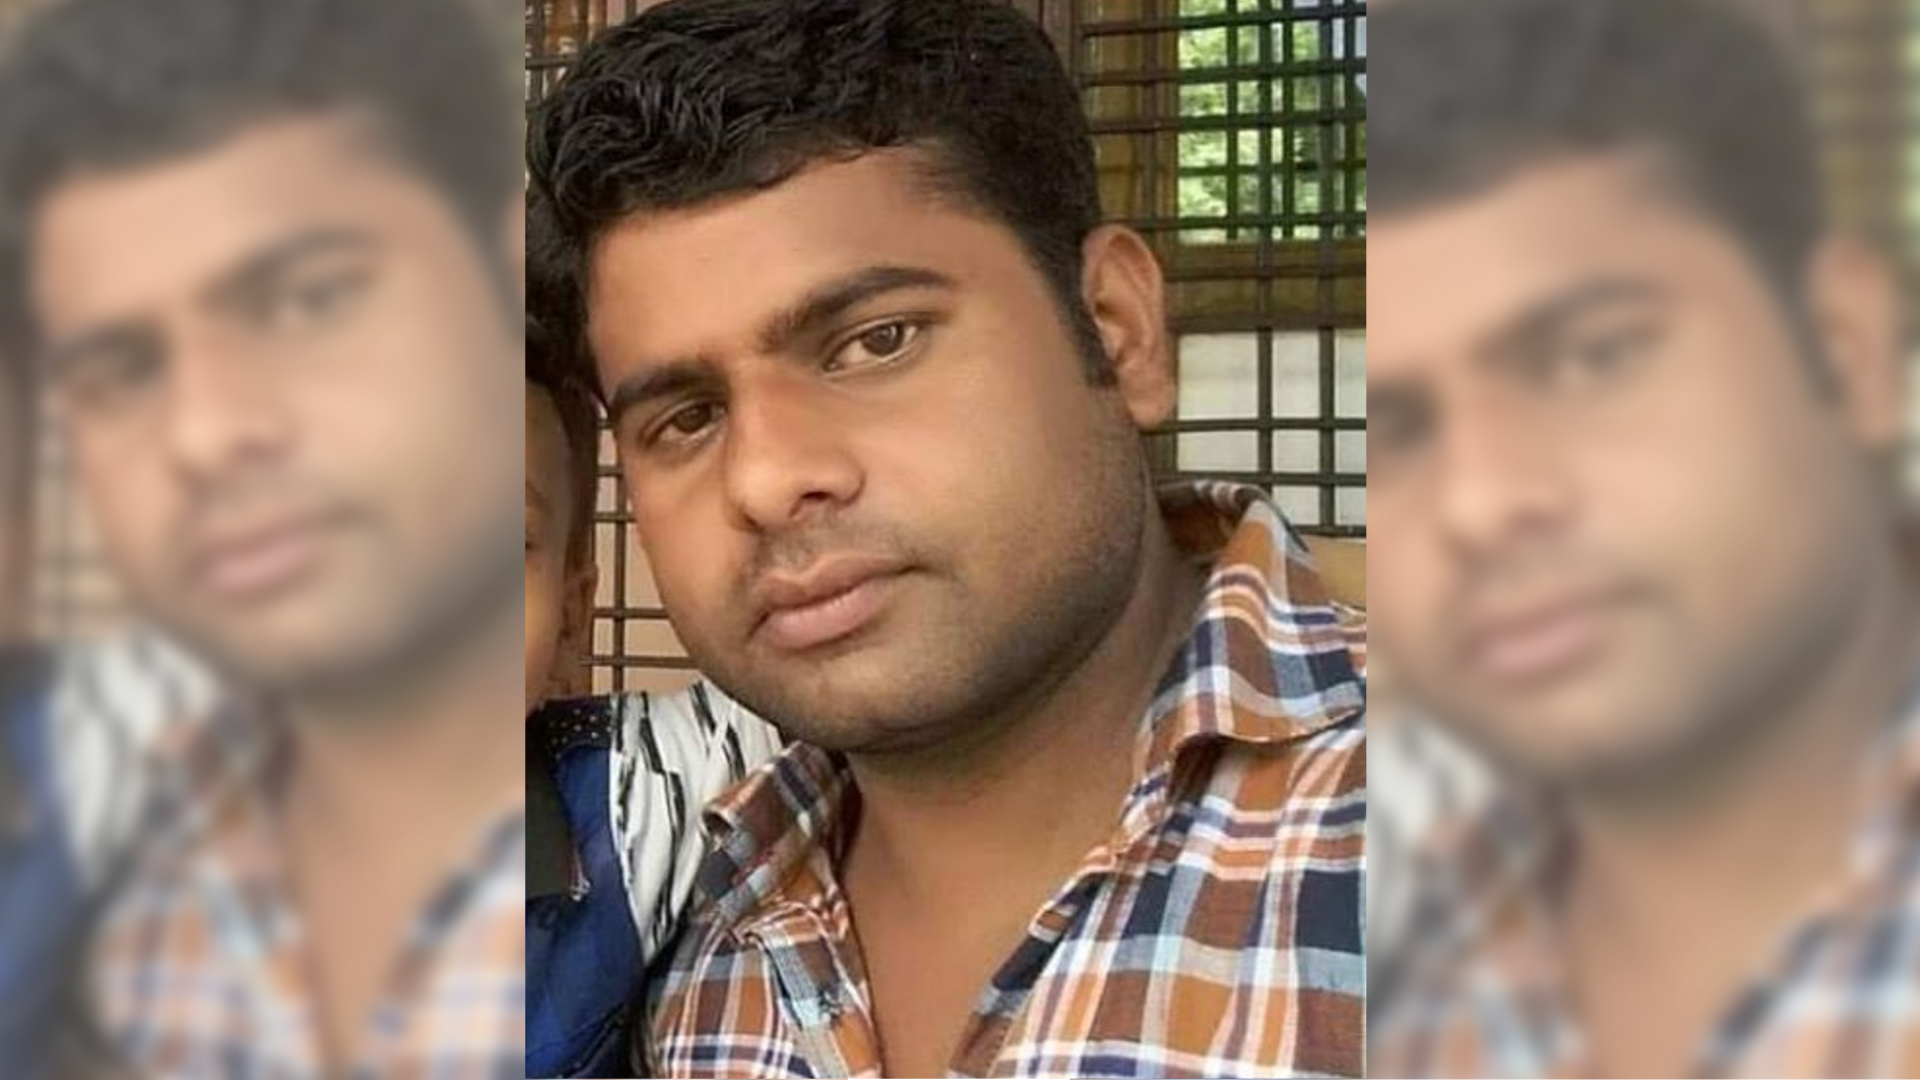 QCrime: FIR in Jhansi 'Encounter'; Salman's House Caretaker Held